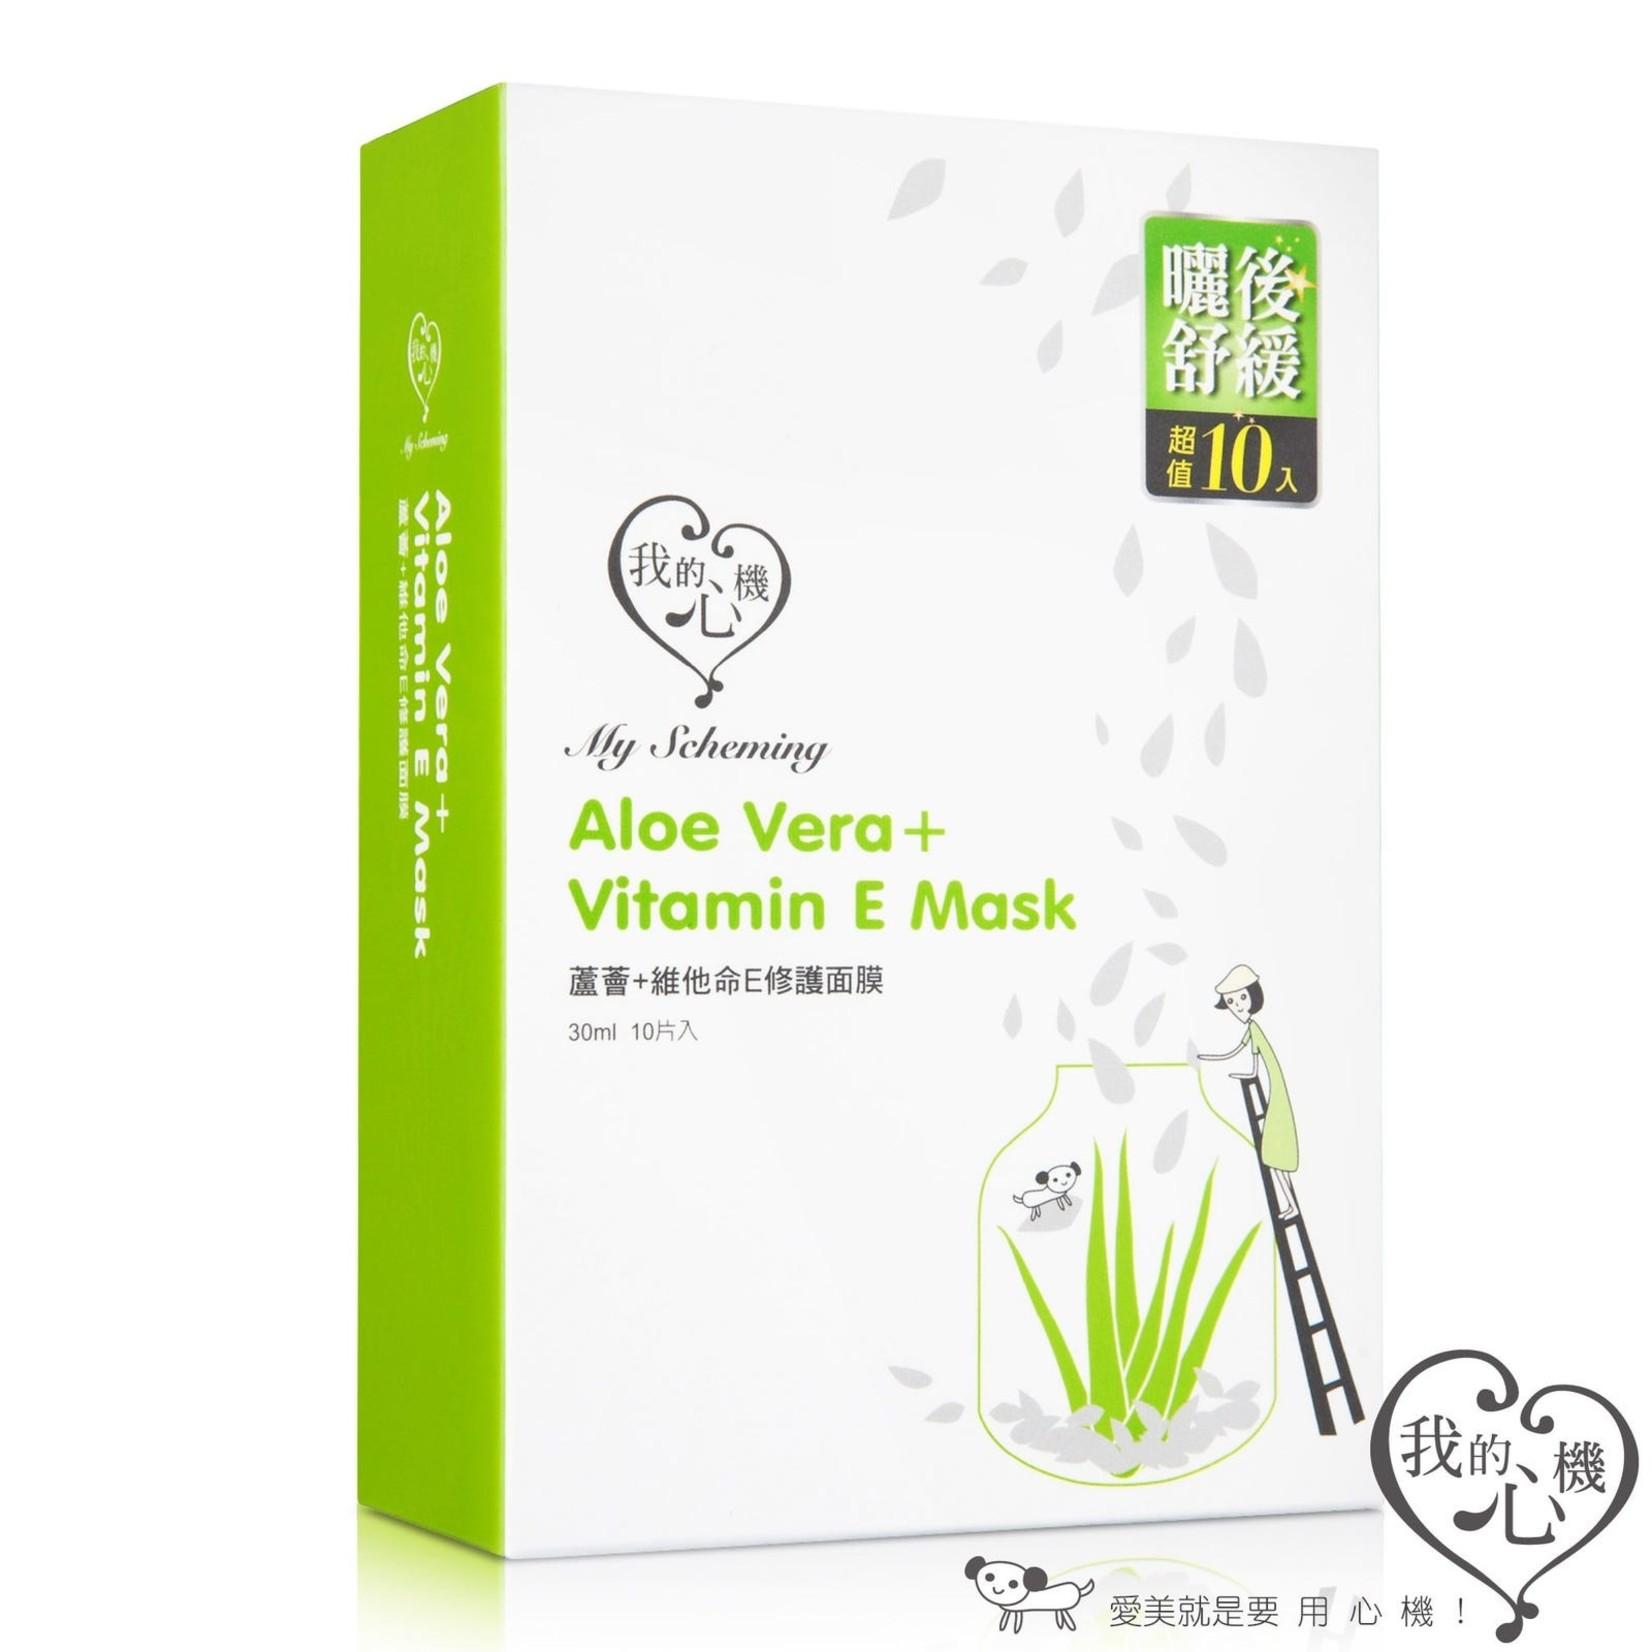 My Scheming Aloe Vera + Vitamin E Mask(10 pcs)